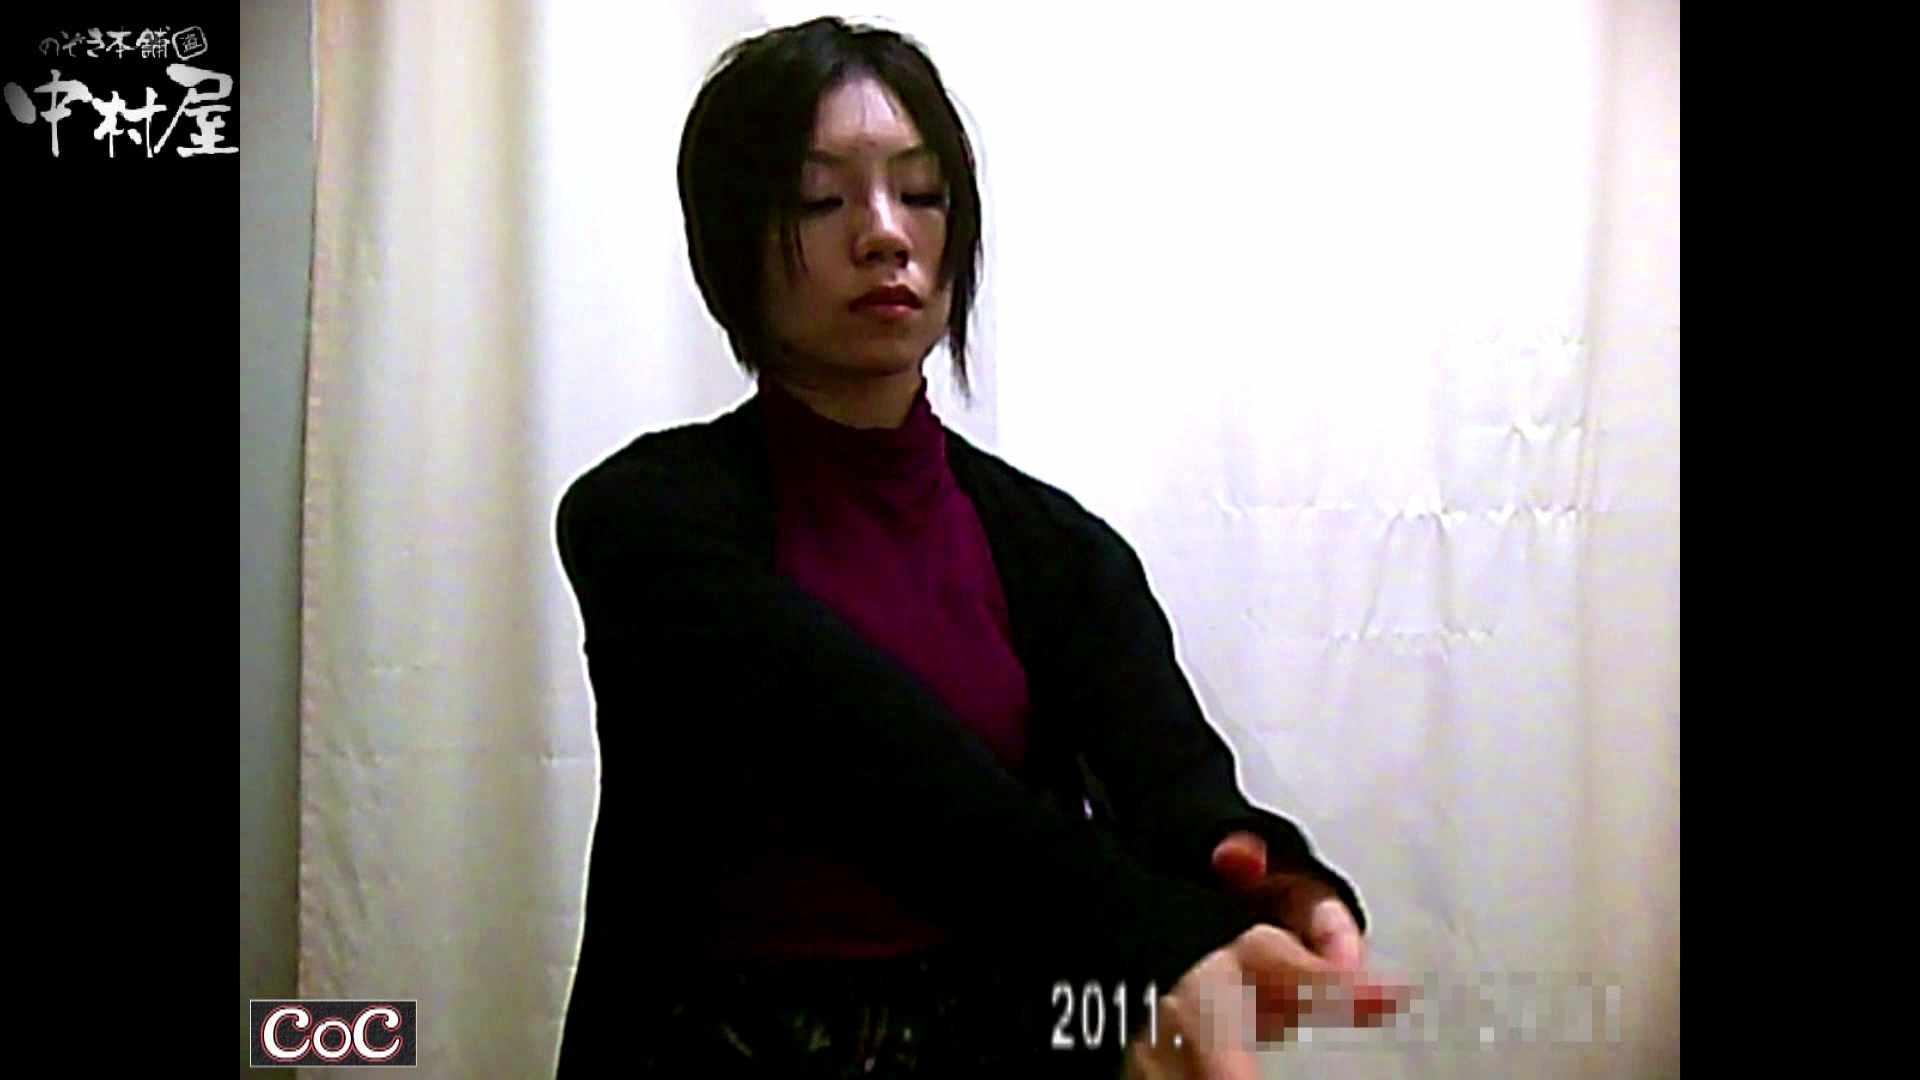 Doctor-X元医者による反抗vol.65 OLハメ撮り  37Pix 7